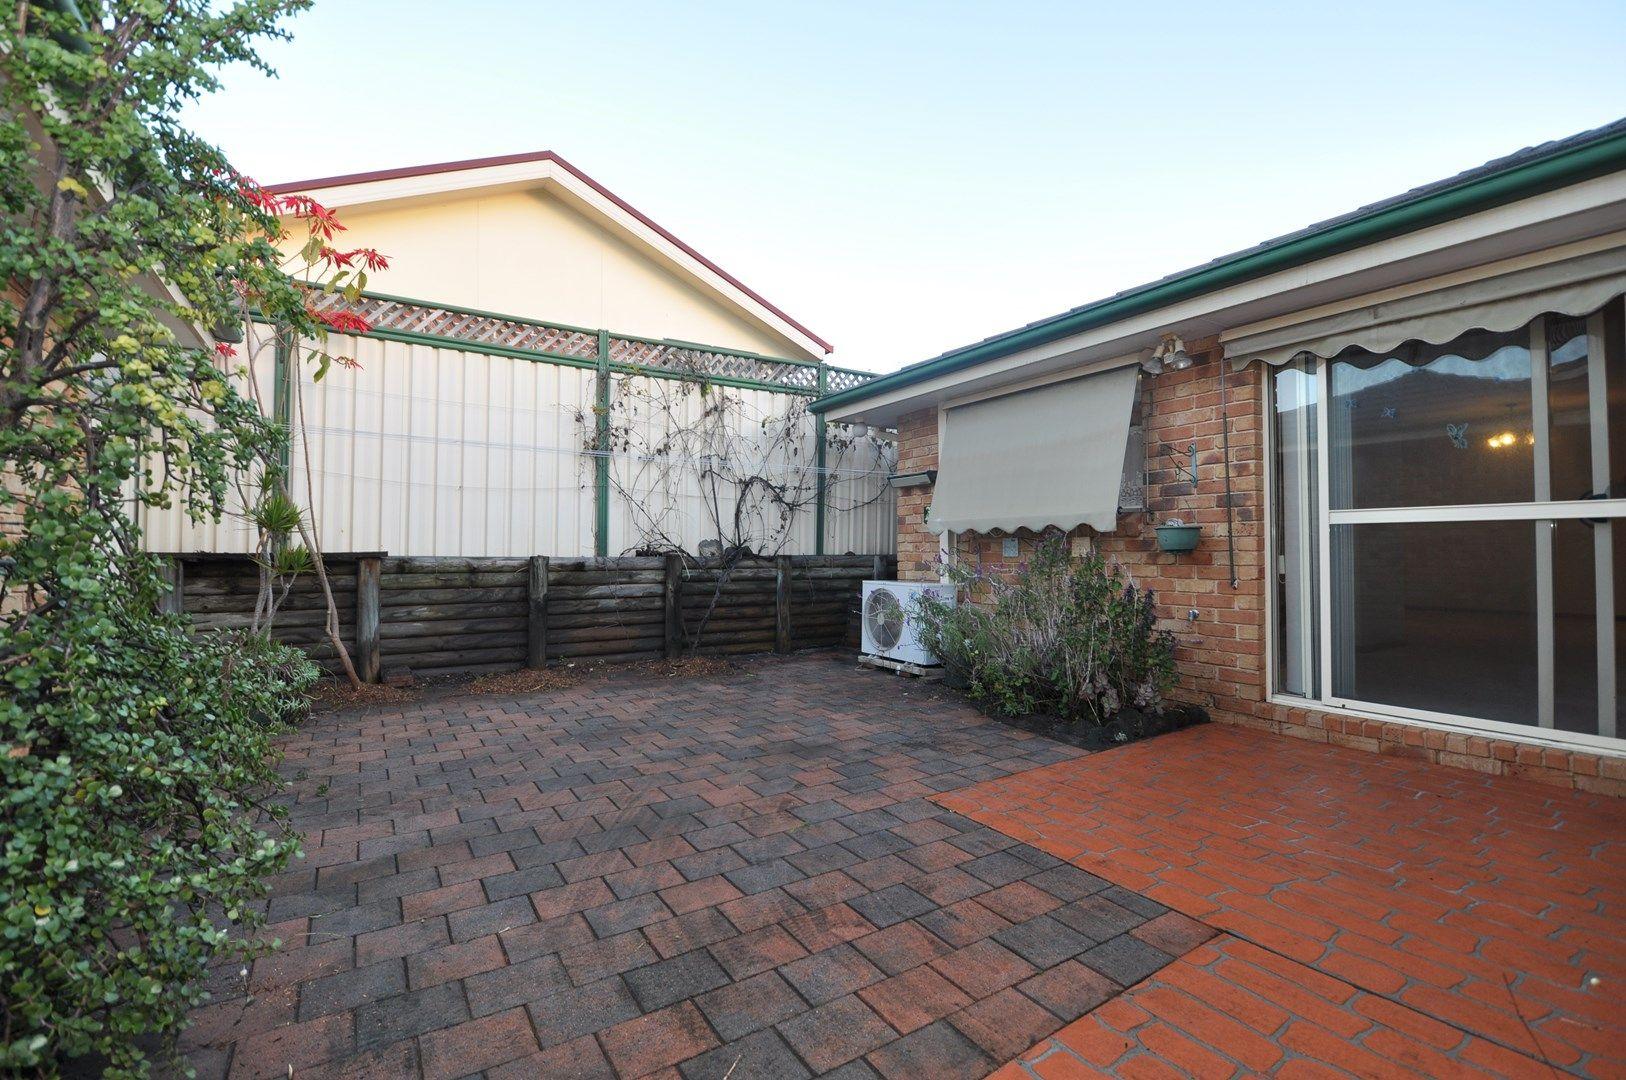 6/72 Victoria Road, Woy Woy NSW 2256, Image 0